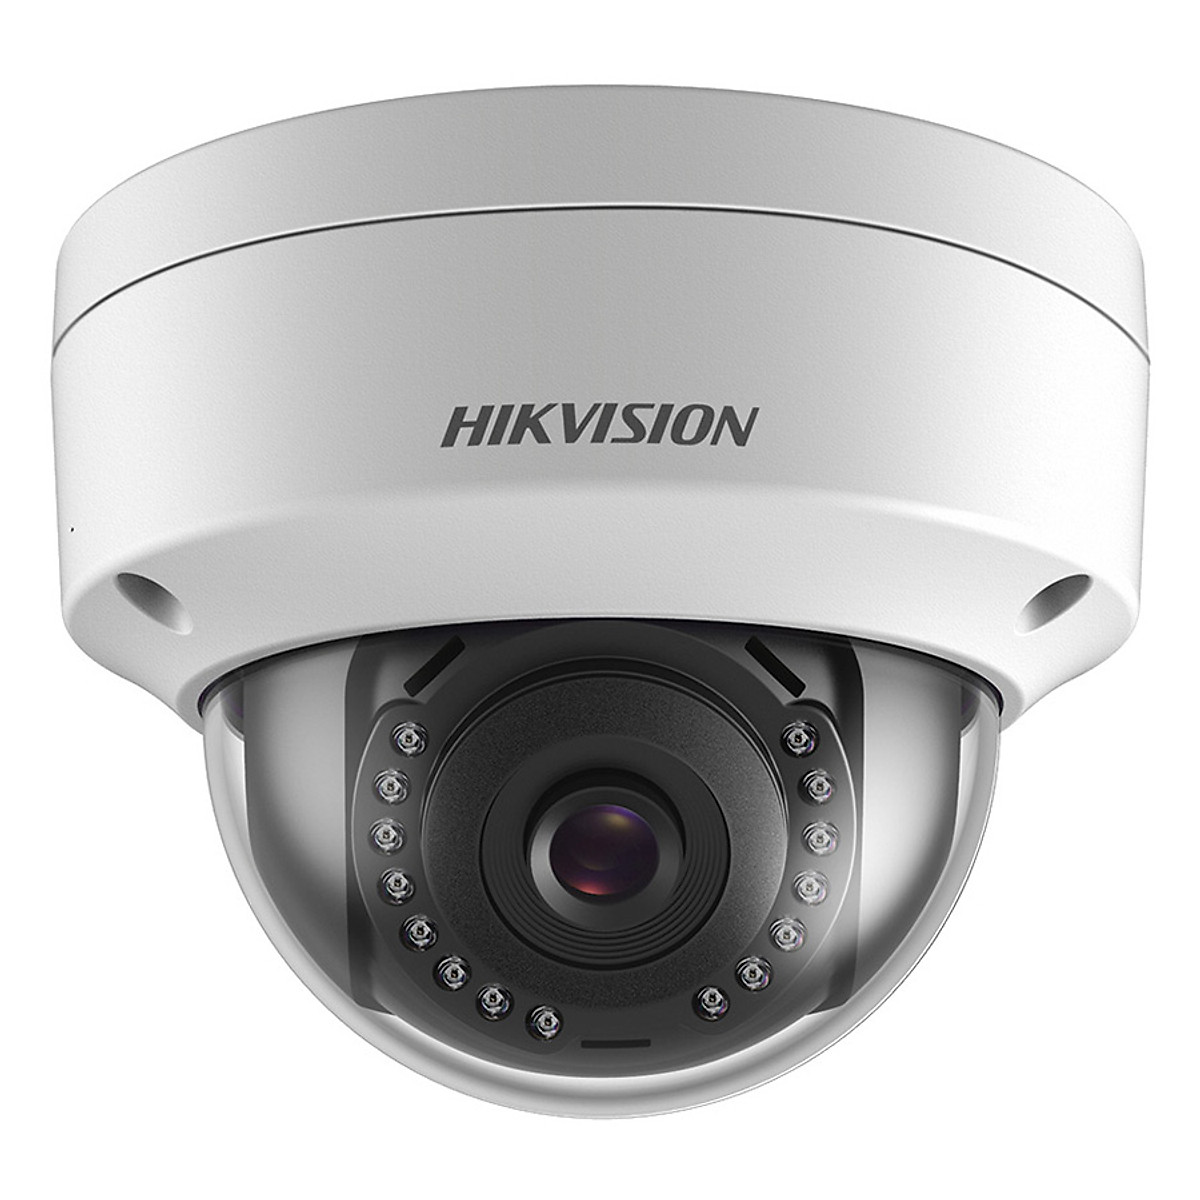 Camera IP HIKVISION DS-2CD1123G0E-I 2.0 Megapixel – Hàng Nhập Khẩu